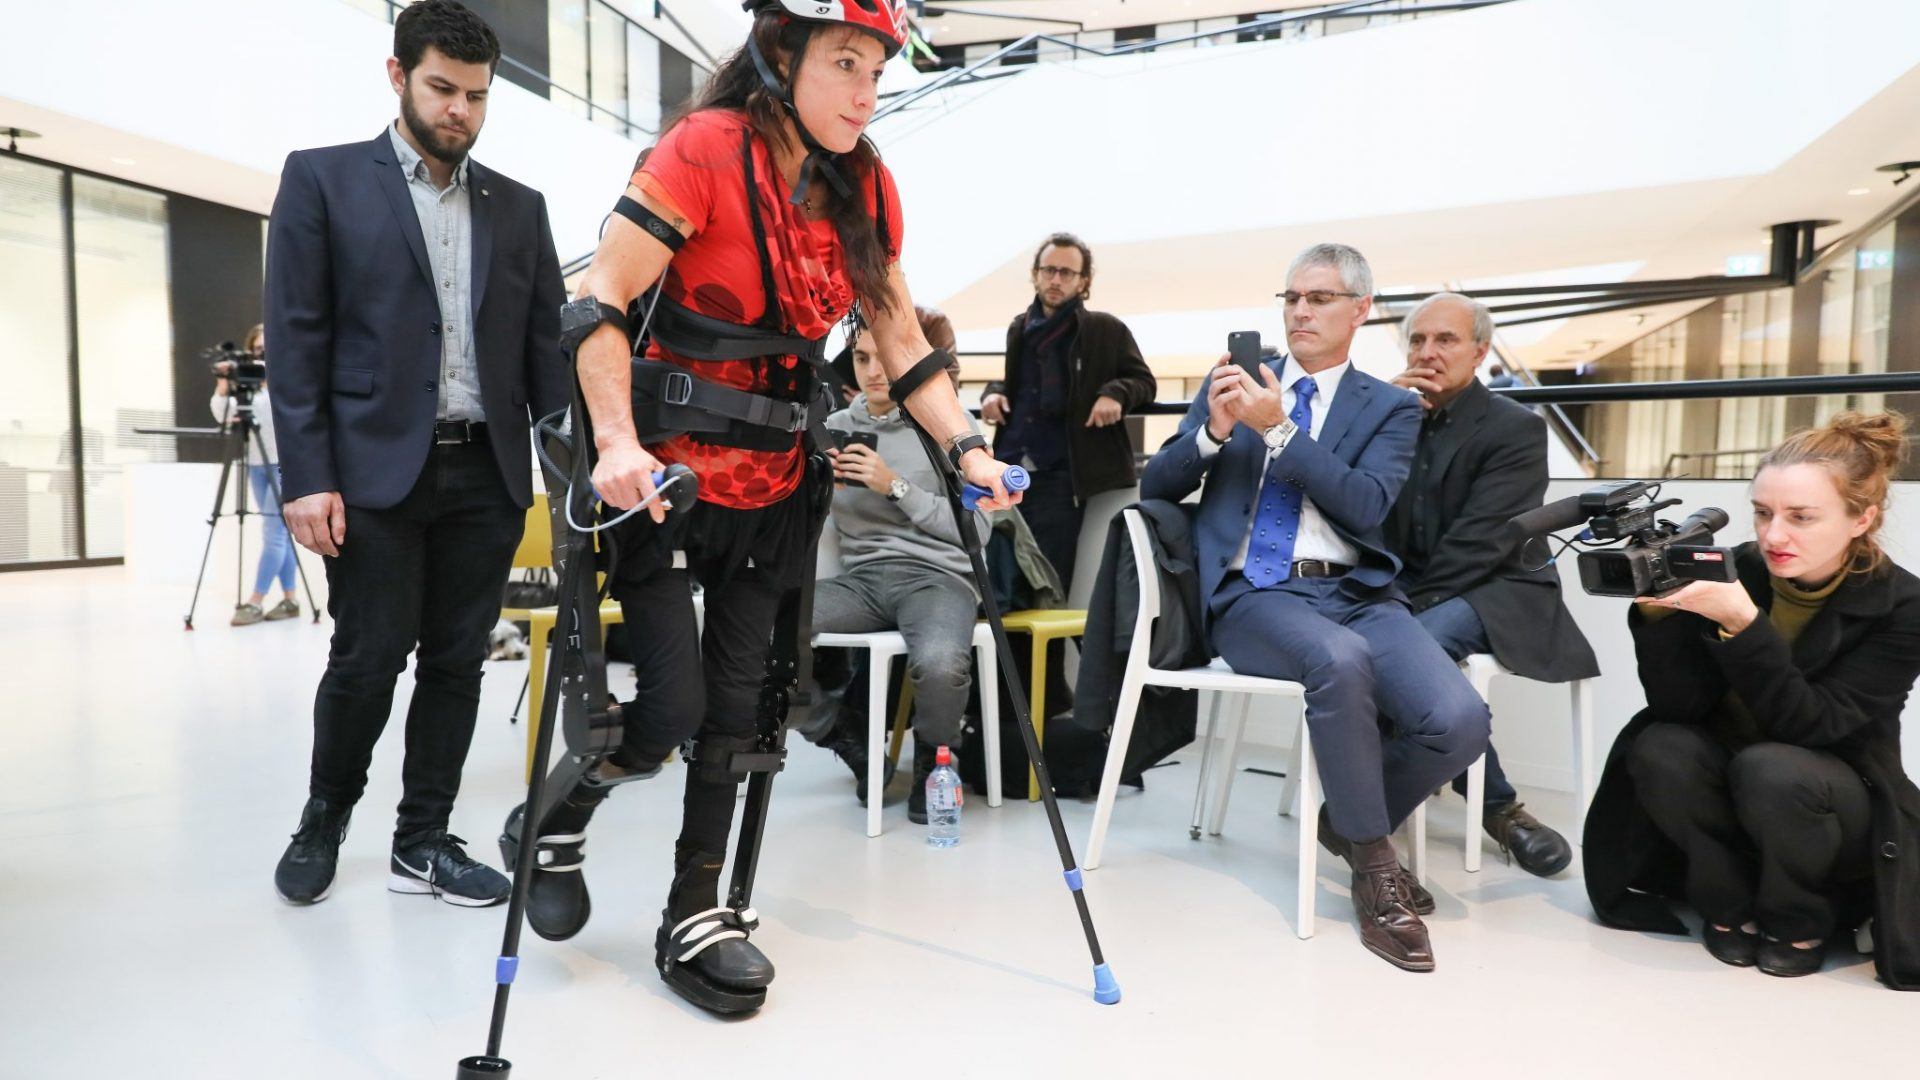 L'athlète handisport Silke Pan testant l'Exosquelette TWIICE